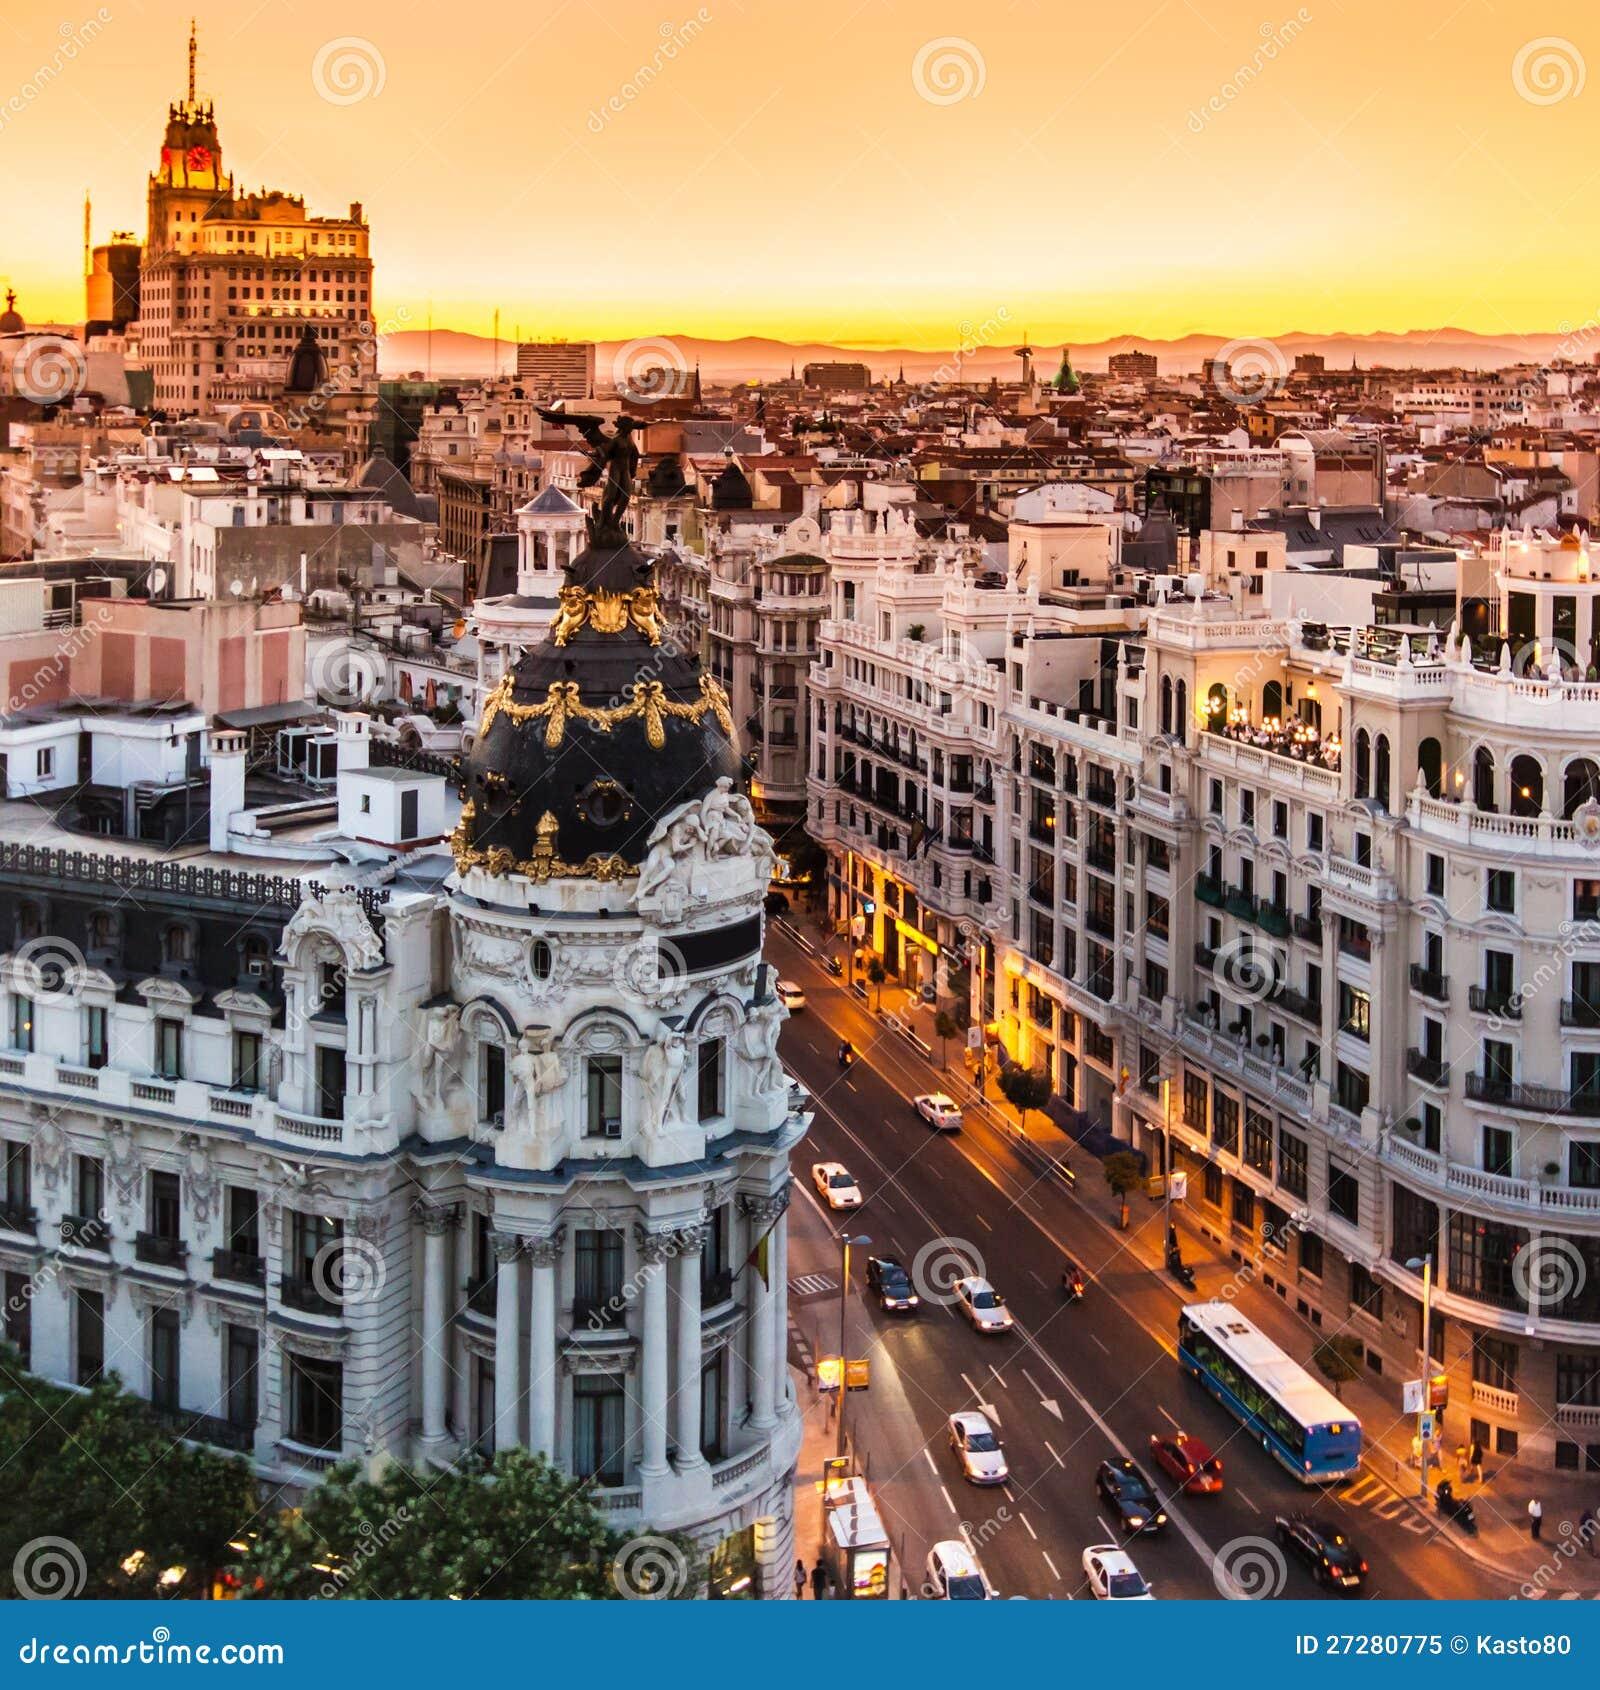 Vista panorámica de Gran vía, Madrid, España.